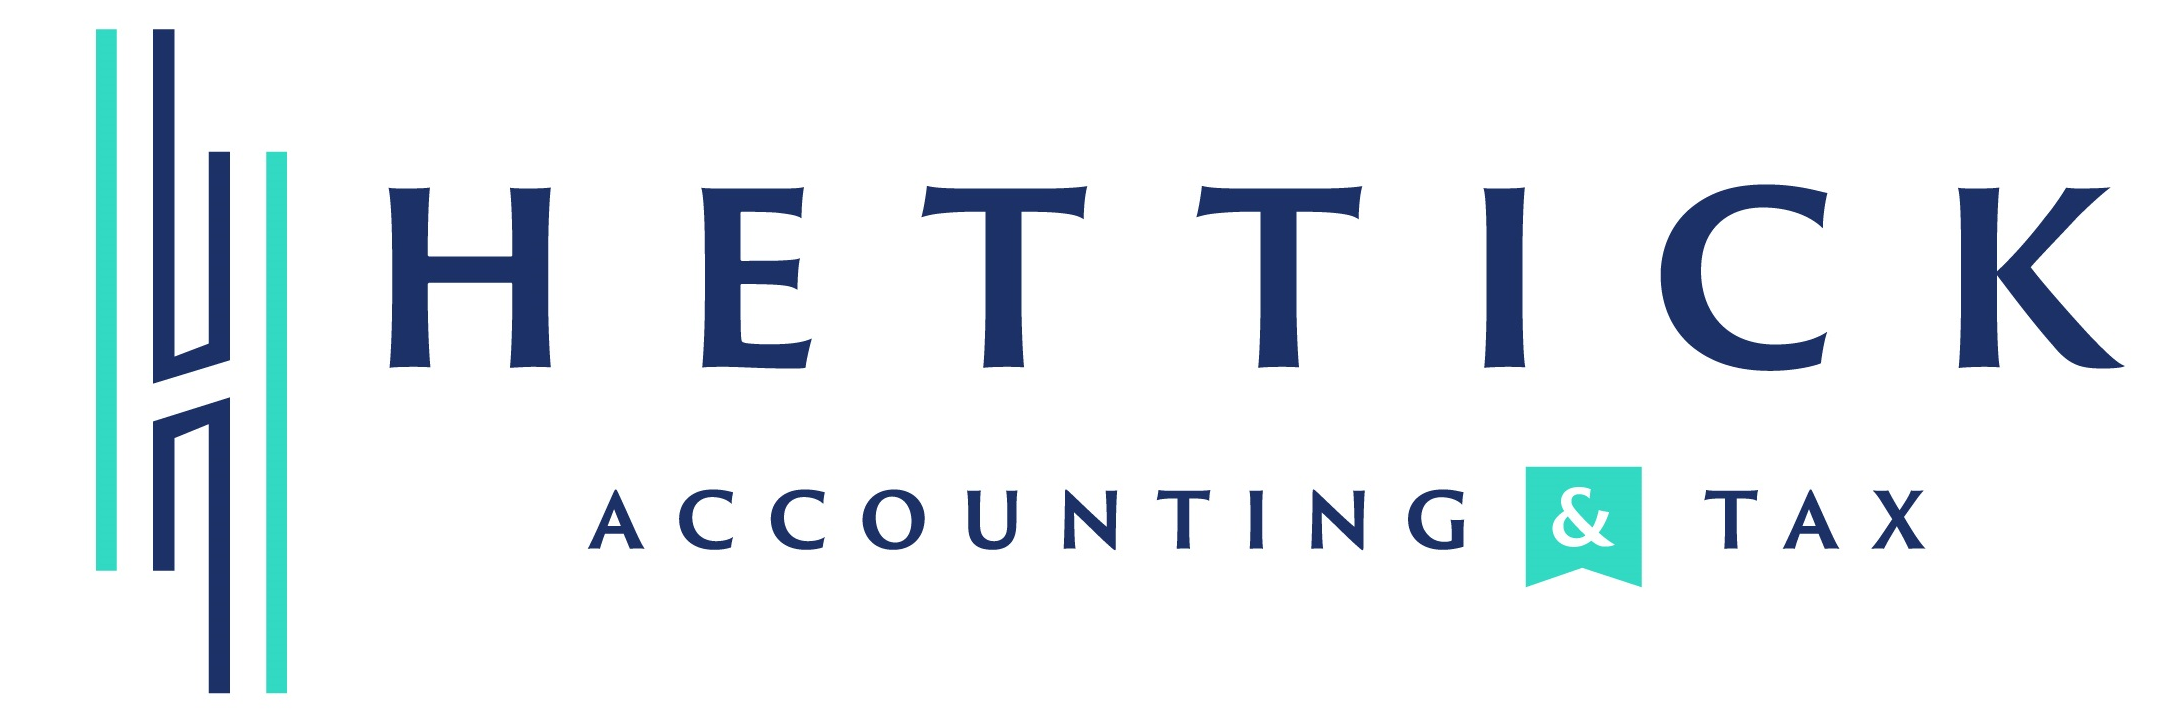 Hettick Accounting & Tax, LLC